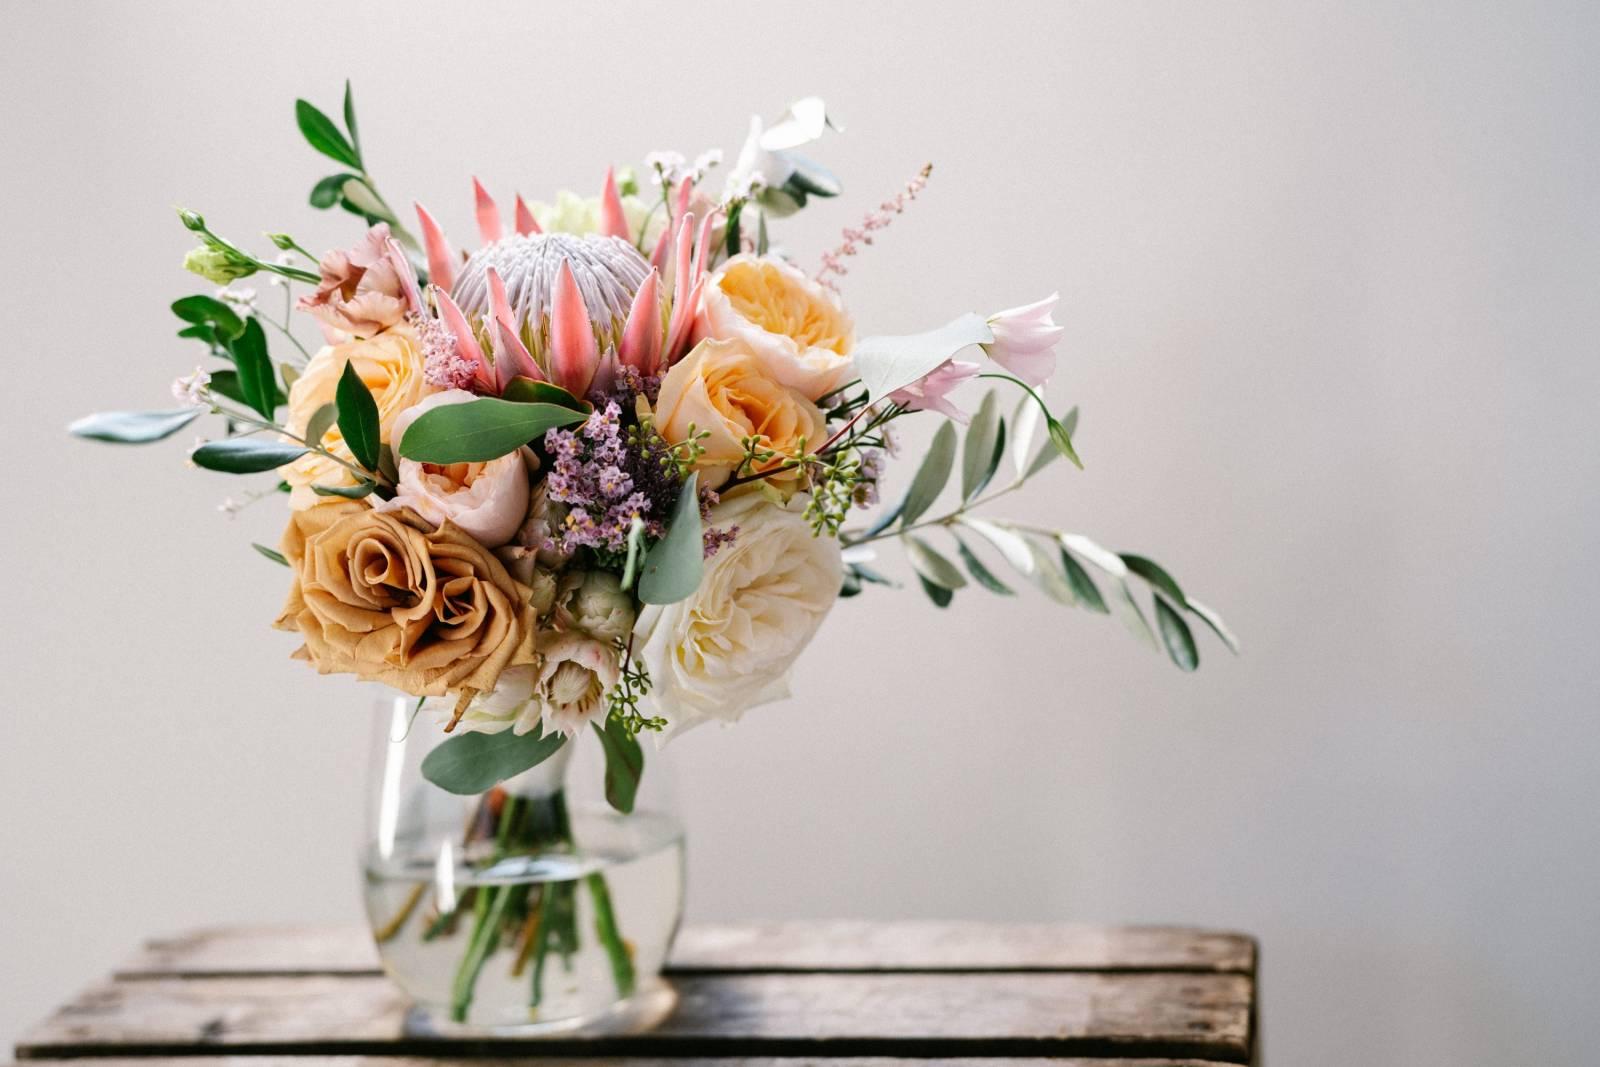 Elegant Events - Weddingplanner - Fotograaf Tom Leuntjens Photography - House of Weddings (2)